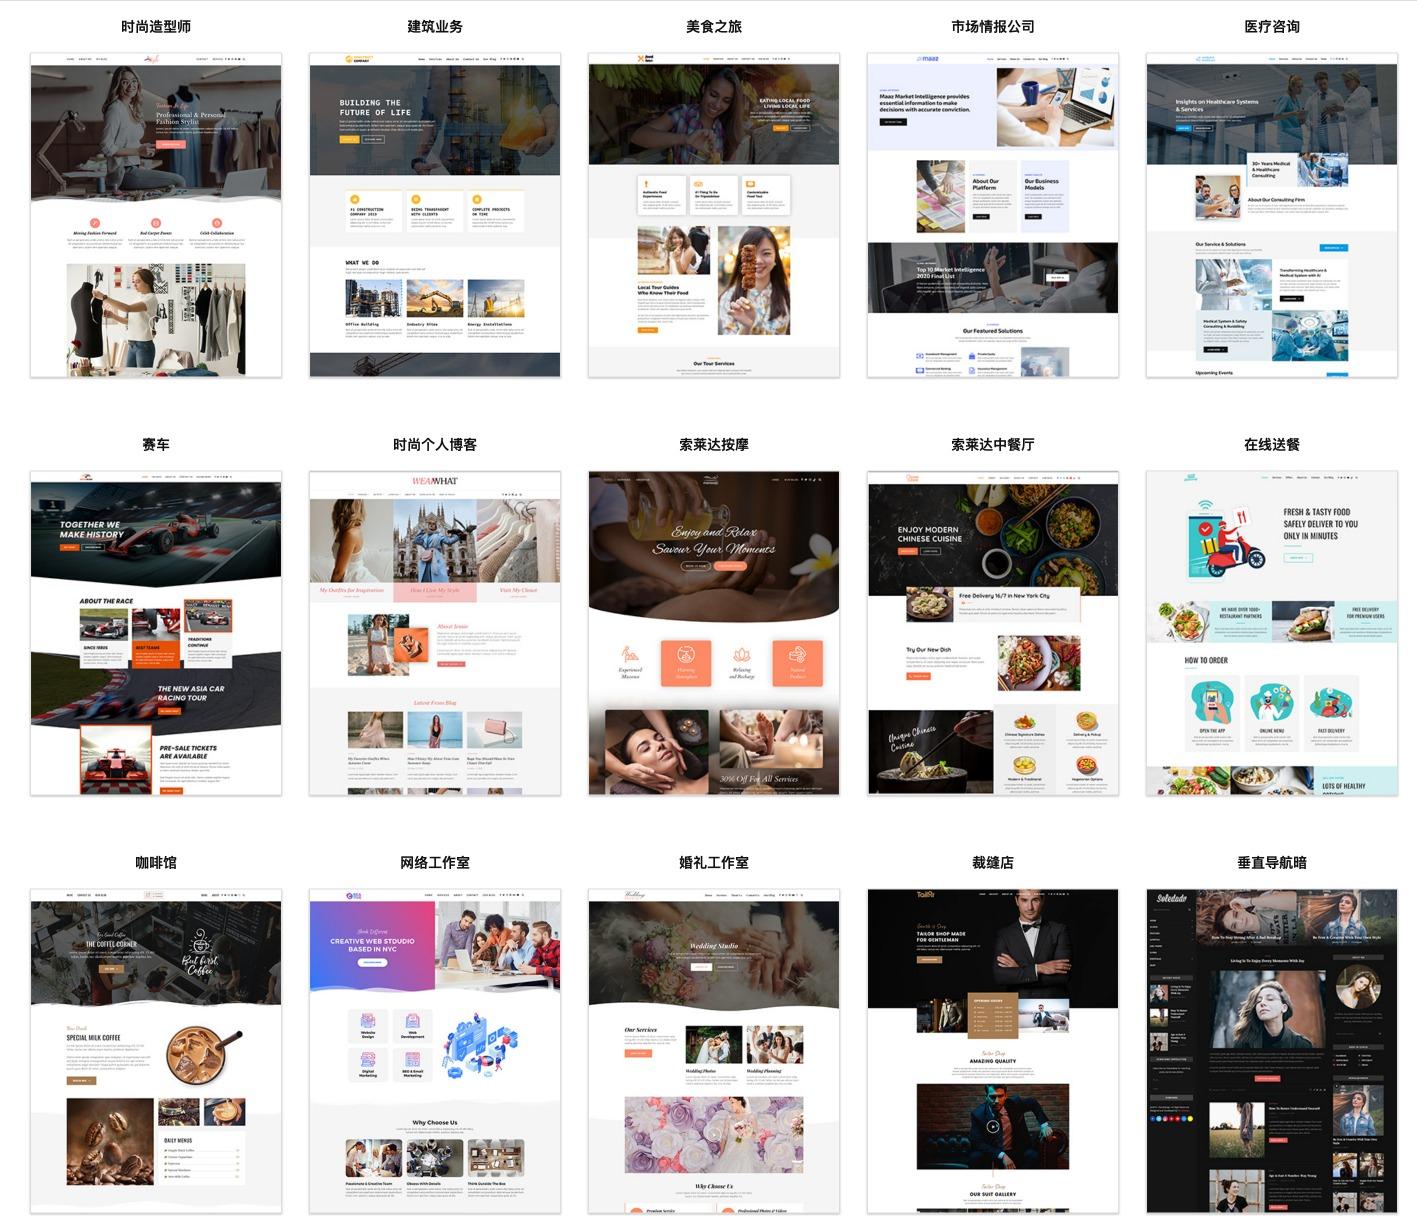 Soledad Theme WordPress 多概念博客杂志主题演示网站